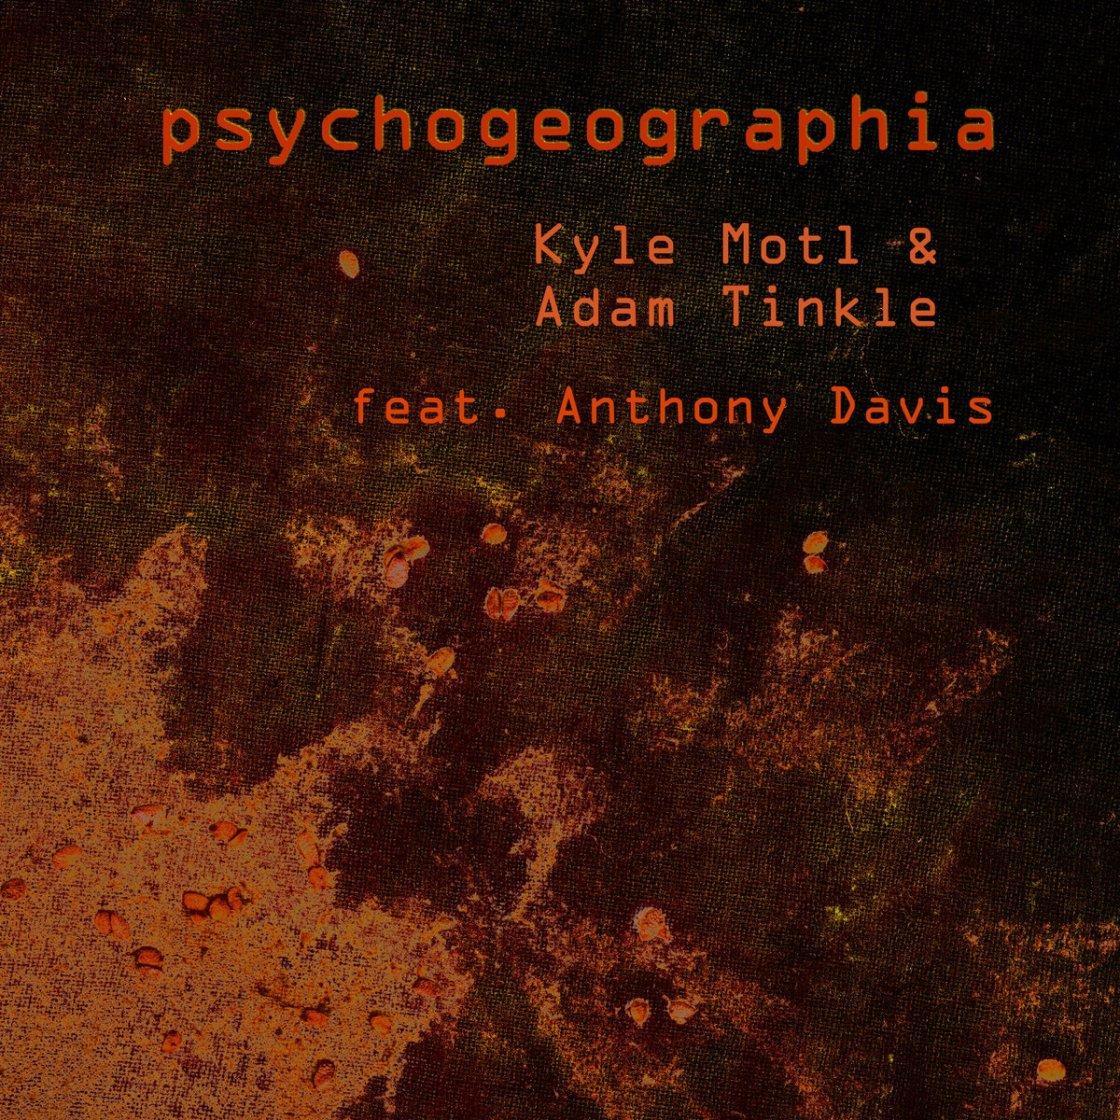 Psychogeographia